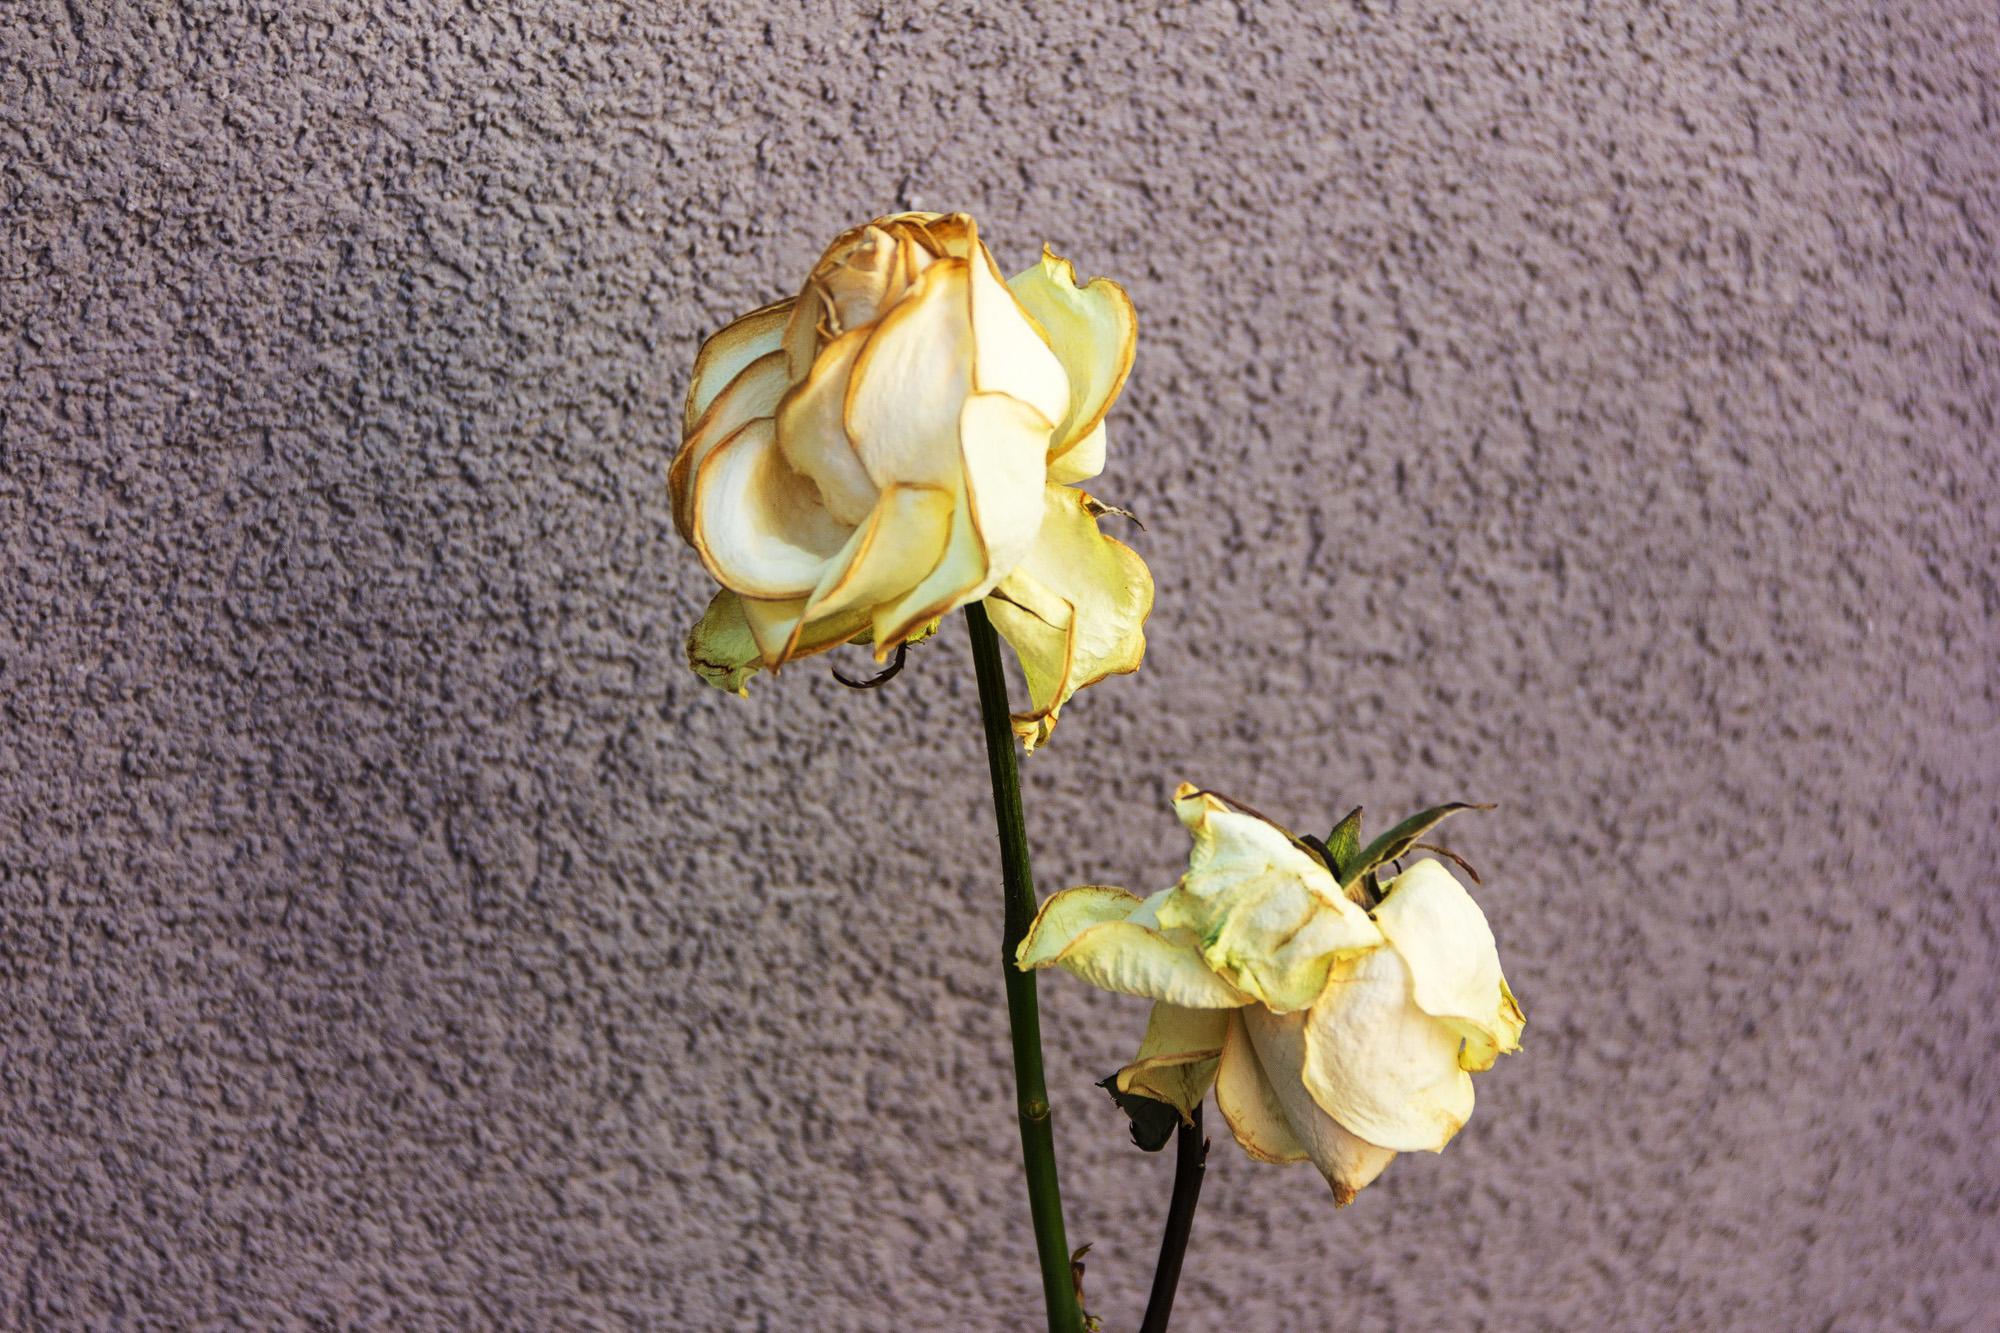 welke cremfarbige Rosen